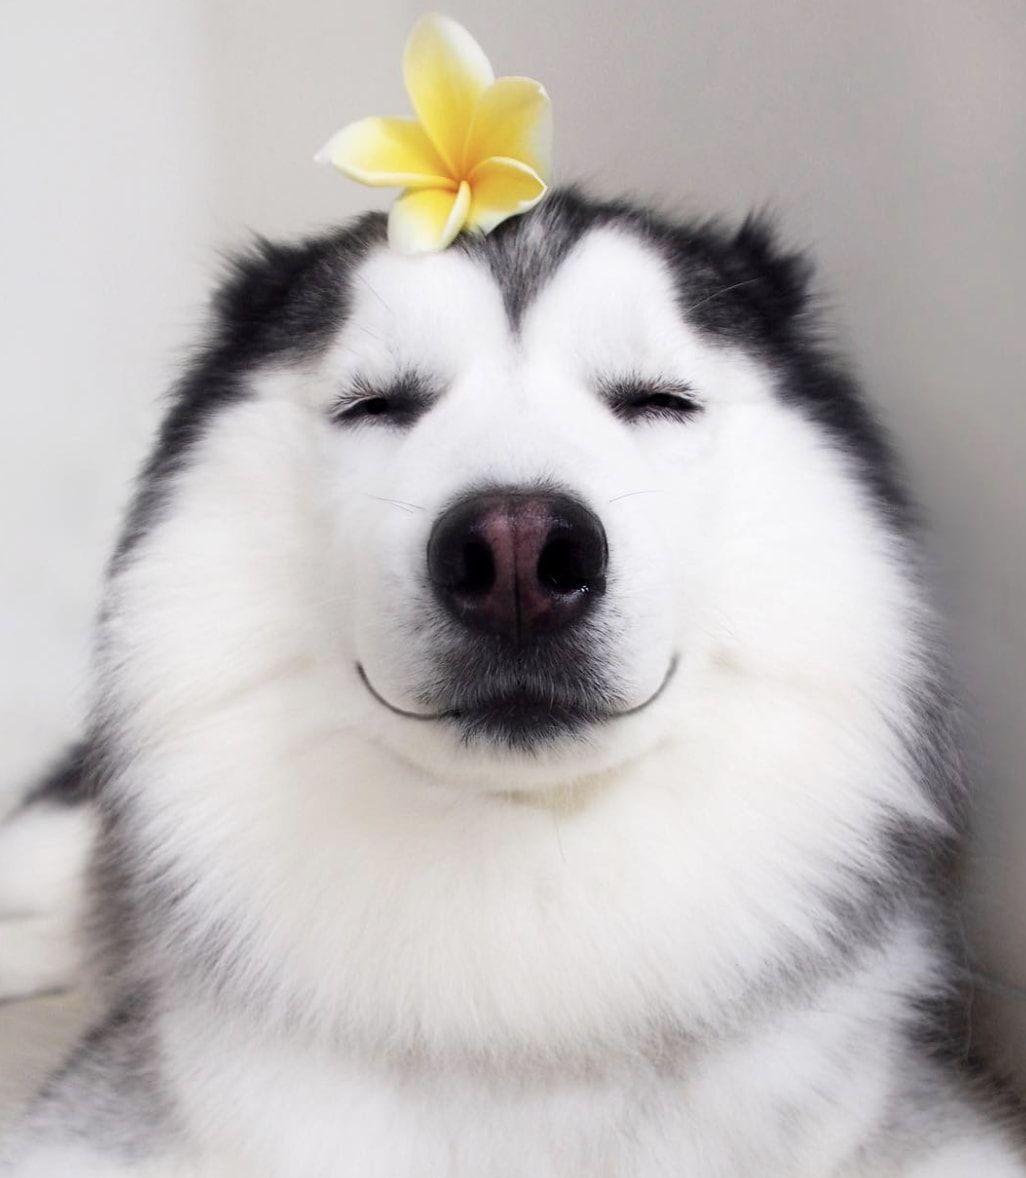 Maru Husky Husky Dogs Cute Animals Happy Dogs